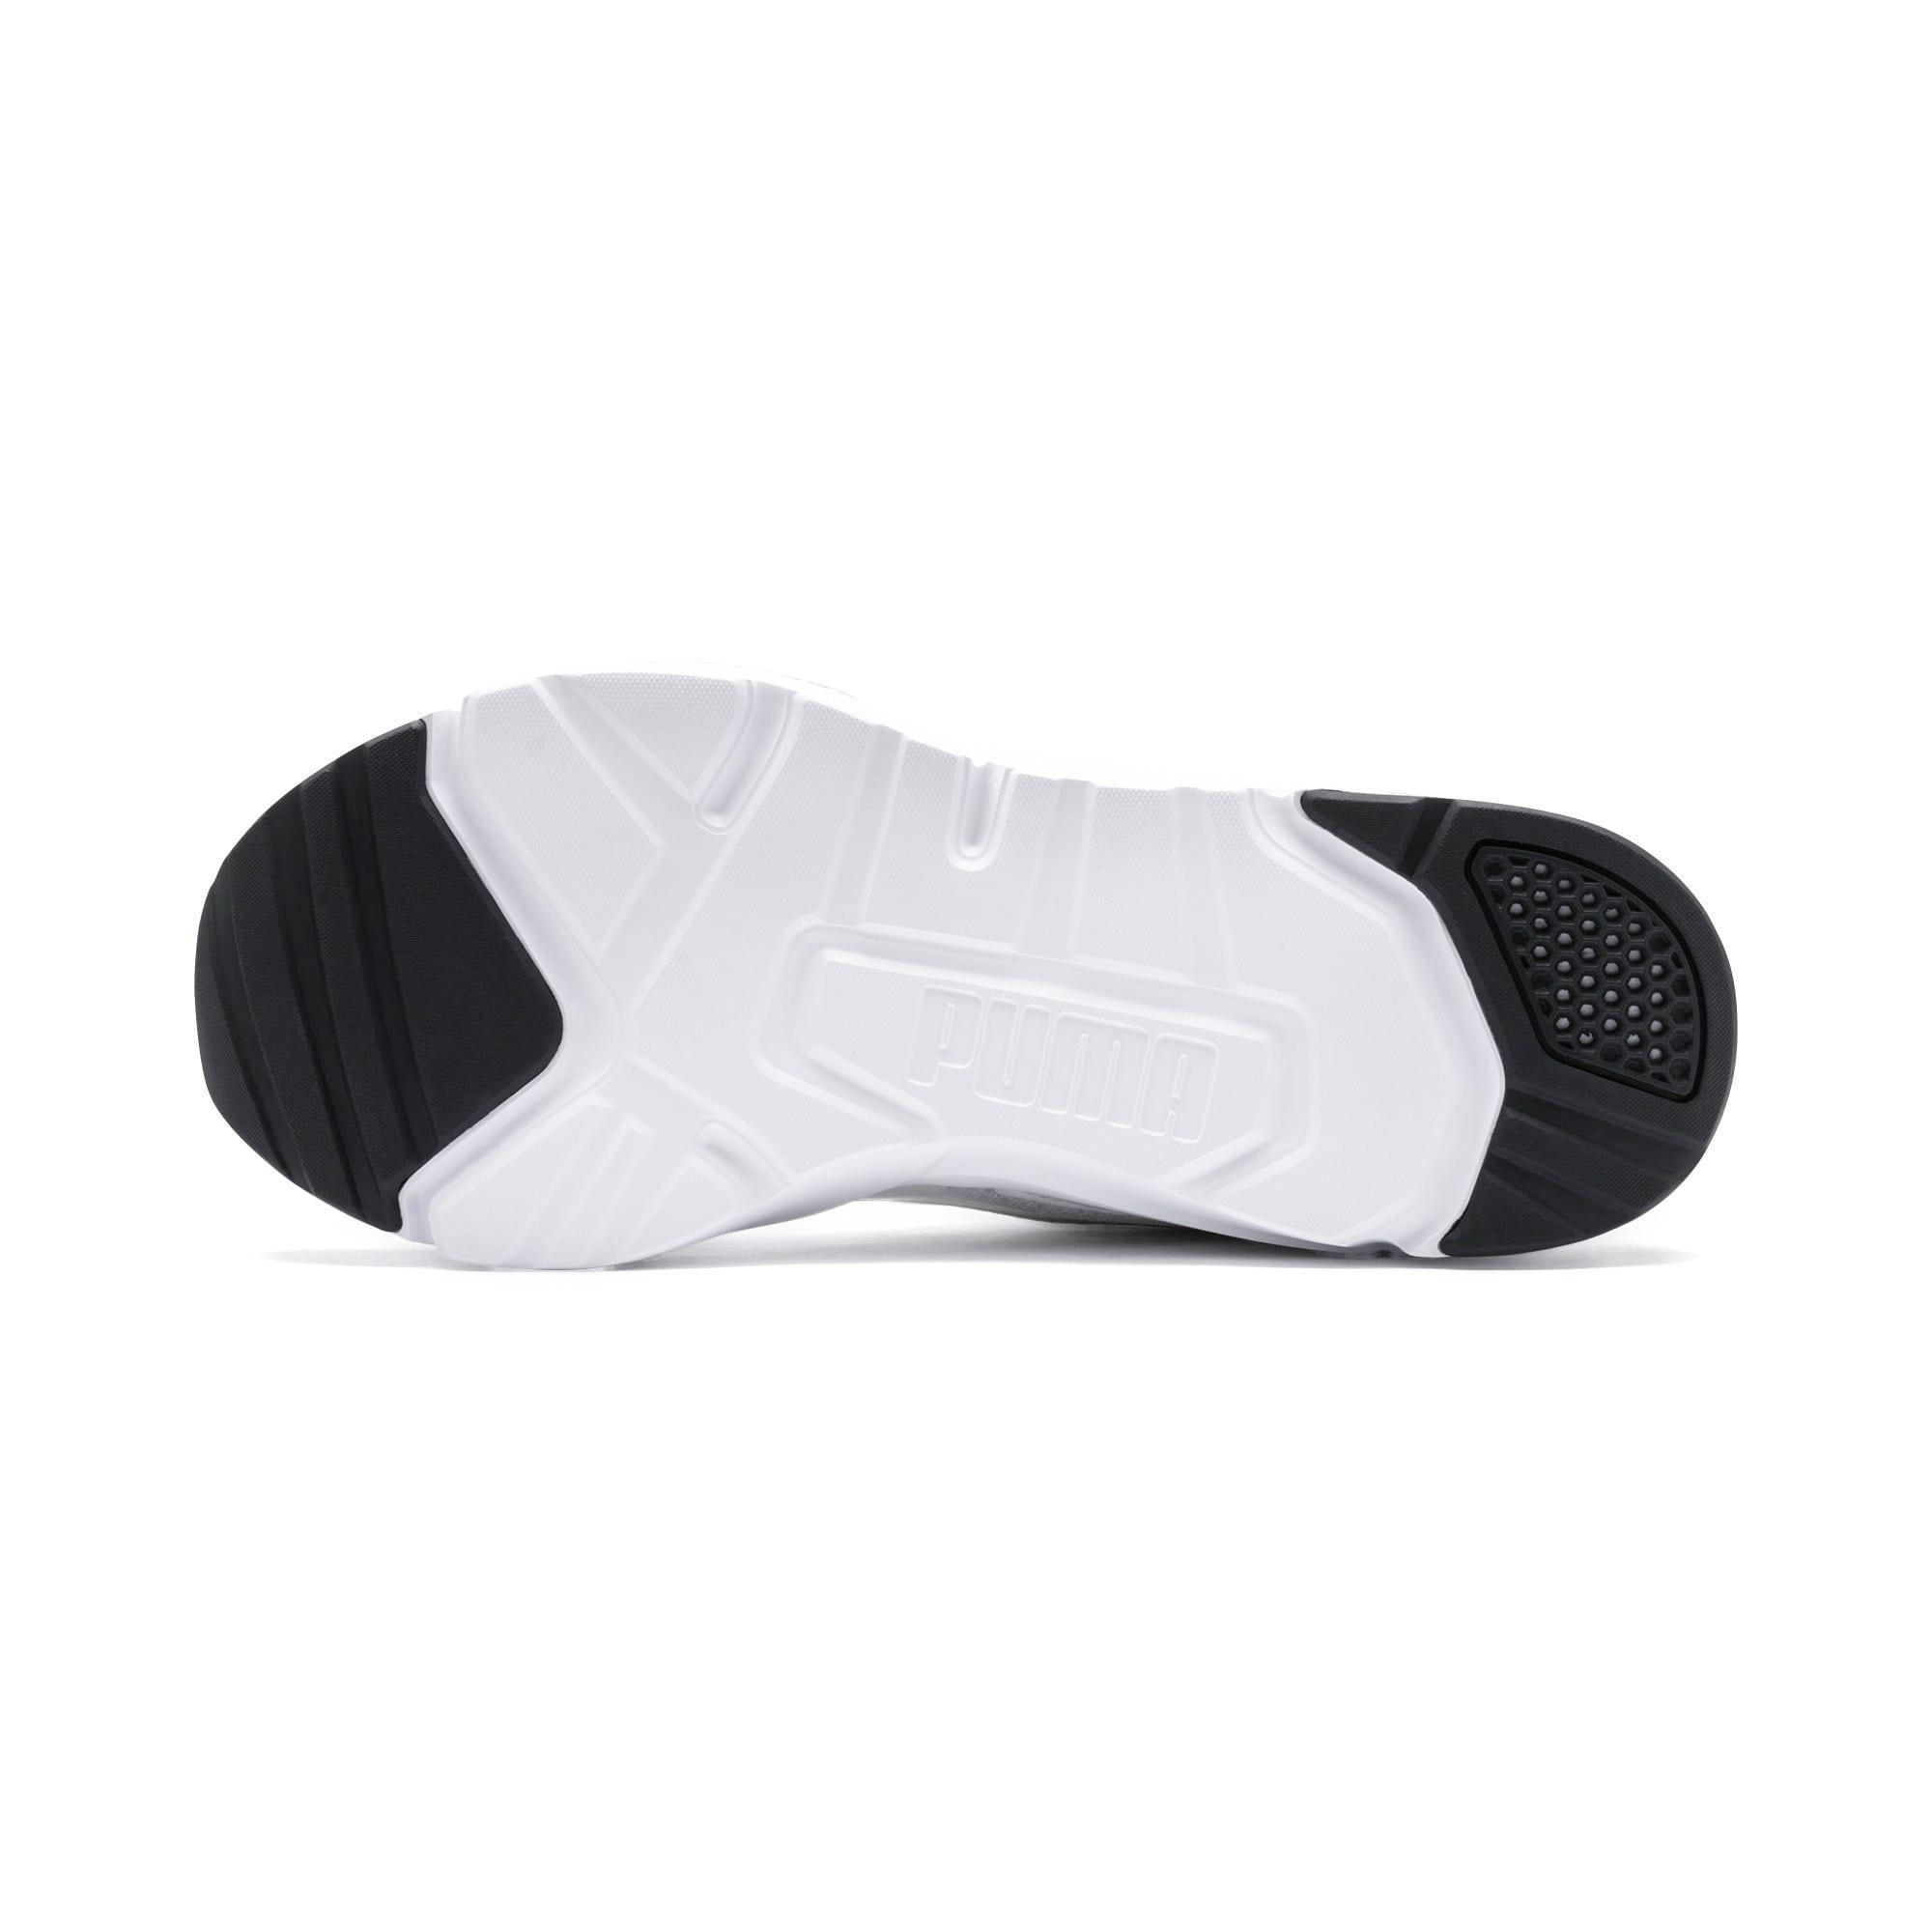 Thumbnail 5 of CELL Phase Lights Men's Training Shoes, Puma White-Gray Violet, medium